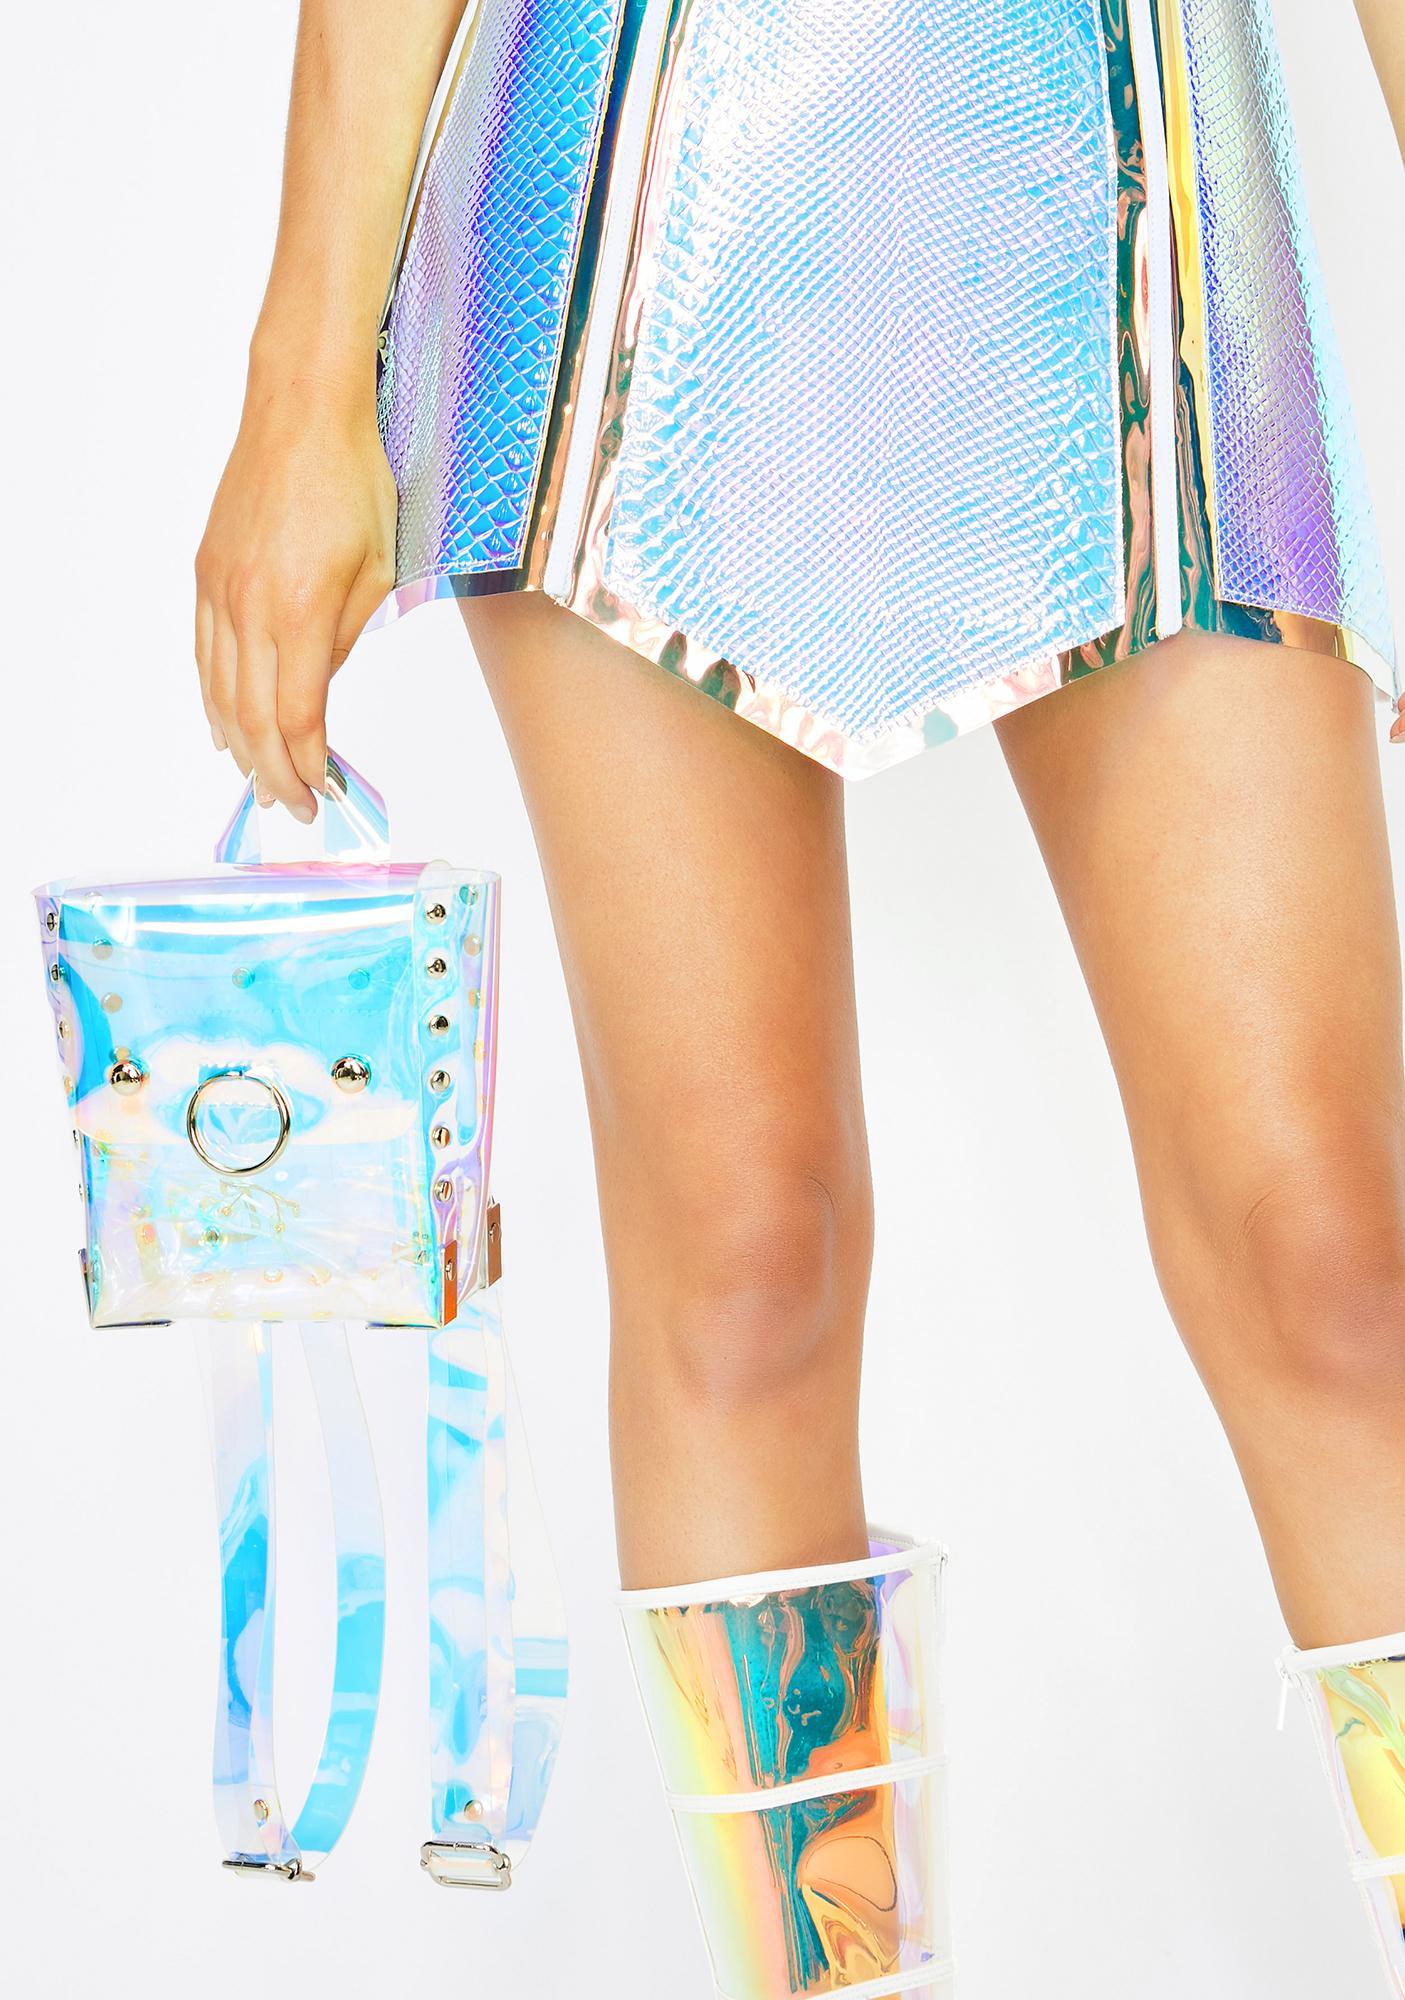 Club Exx Omega Centauri Hologram Backpack